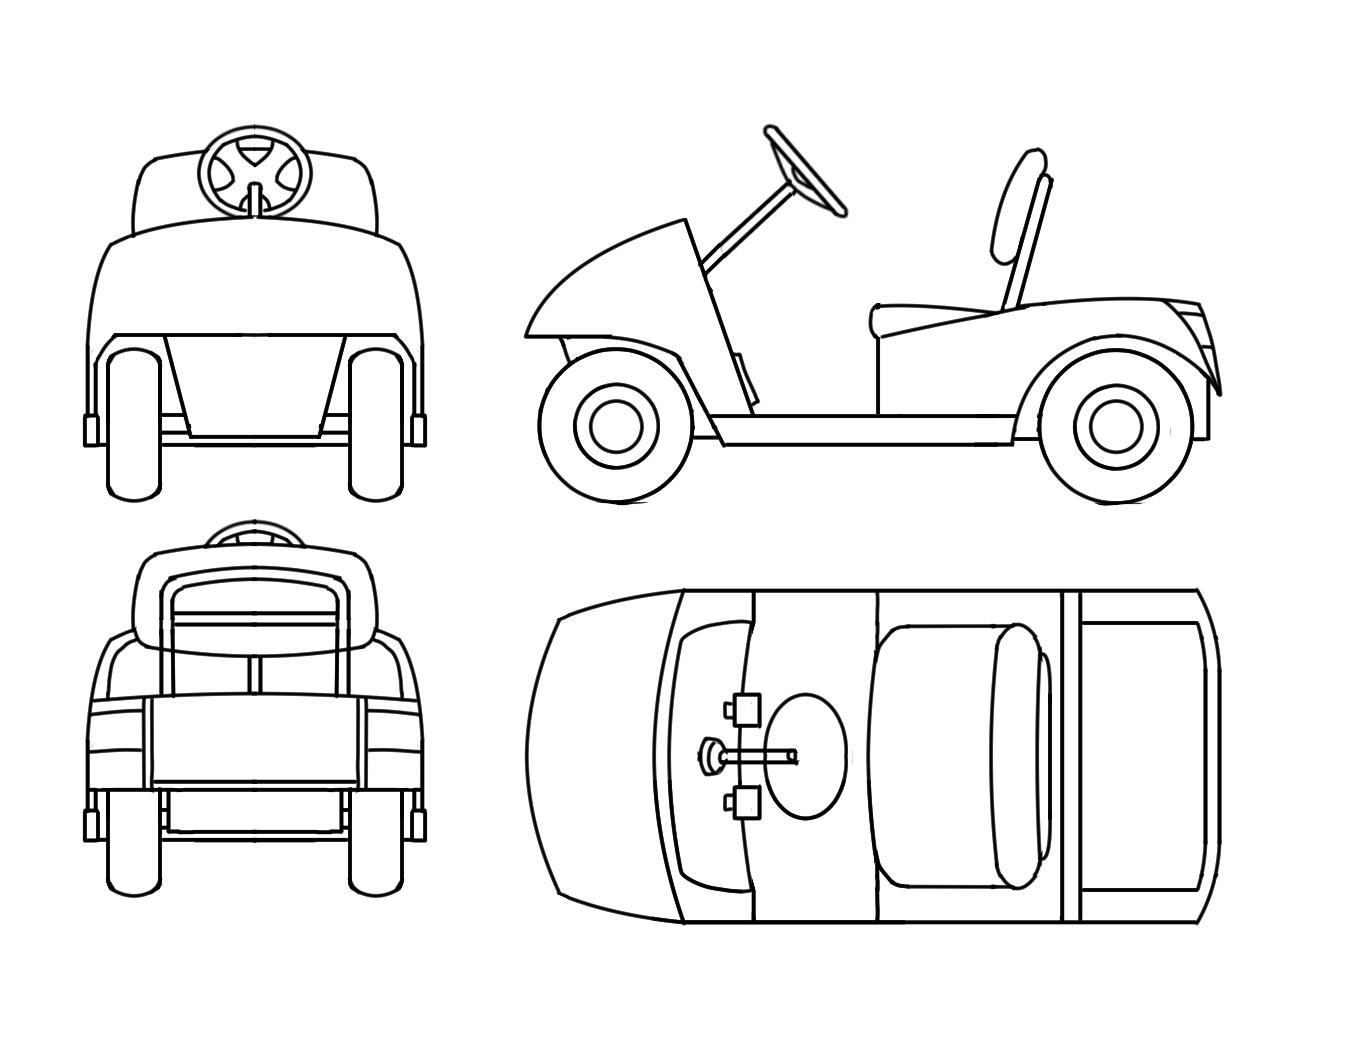 Club car golf cart frame sh3 me for Golf cart plans